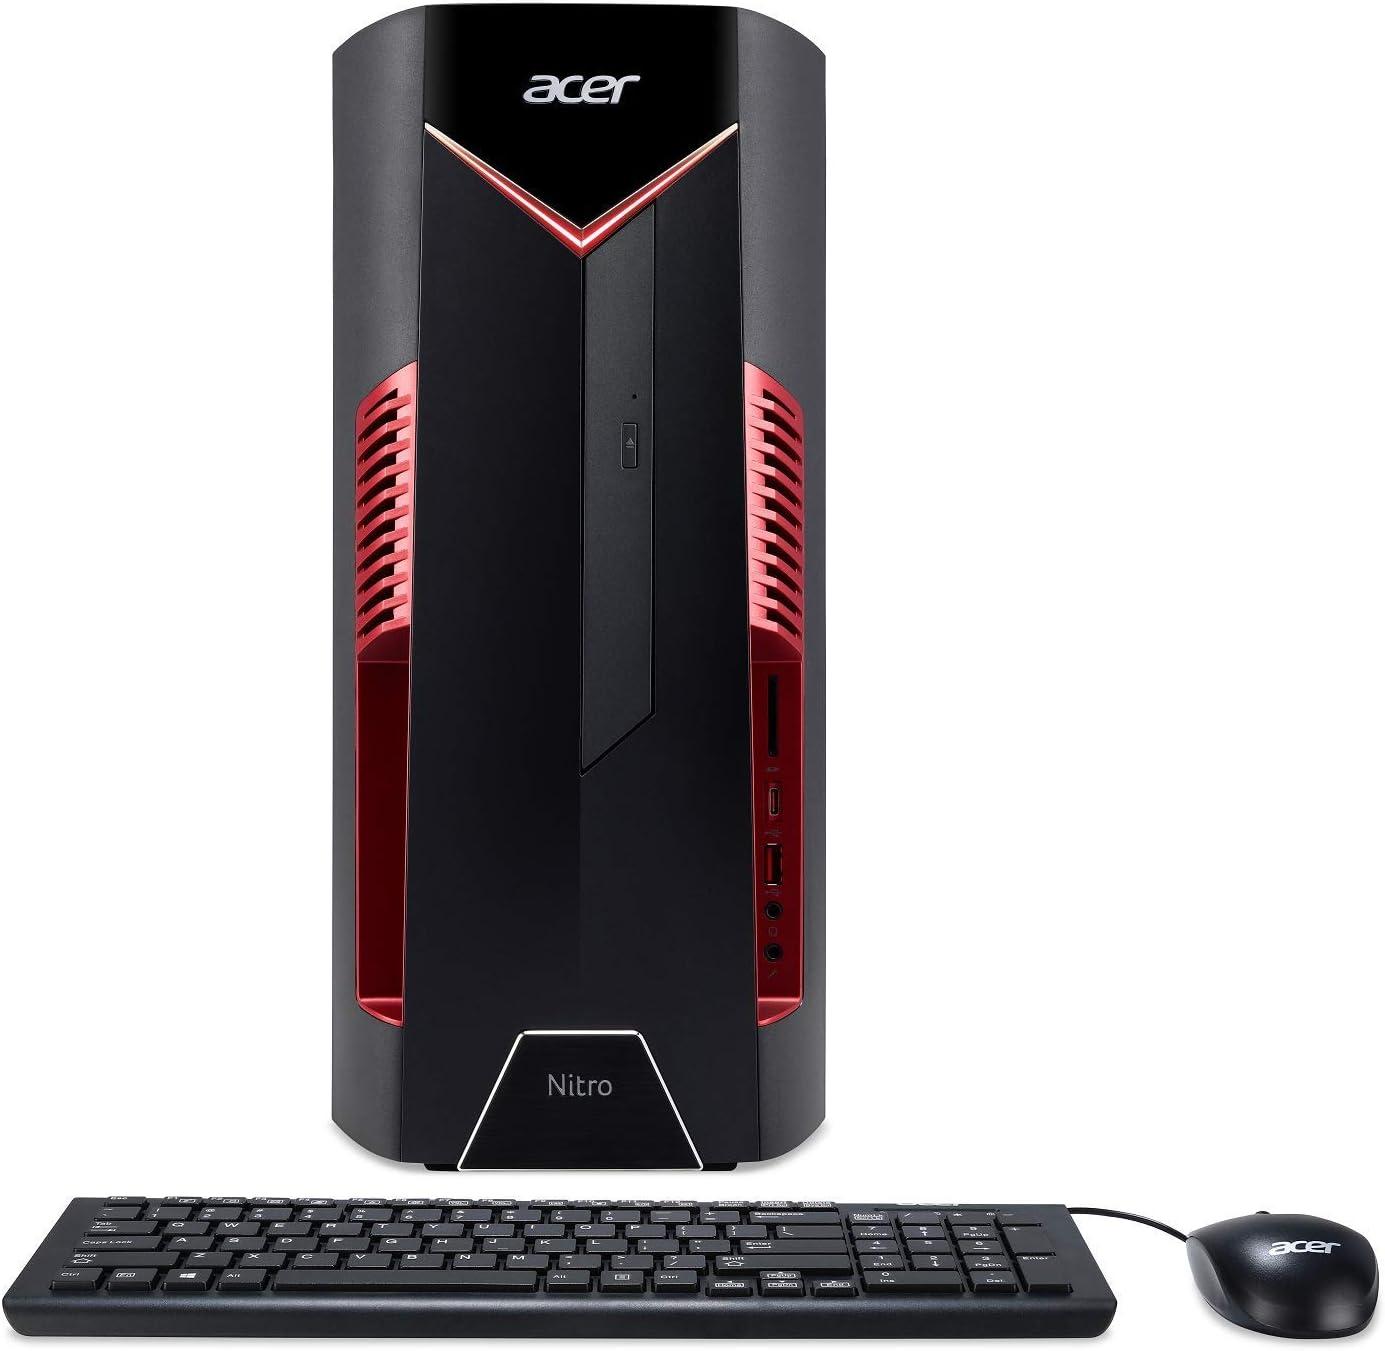 Acer Nitro 50 Desktop Intel Core i5 2.80 GHz 8 GB RAM 1 TB HDD Windows 10 Home (Renewed)